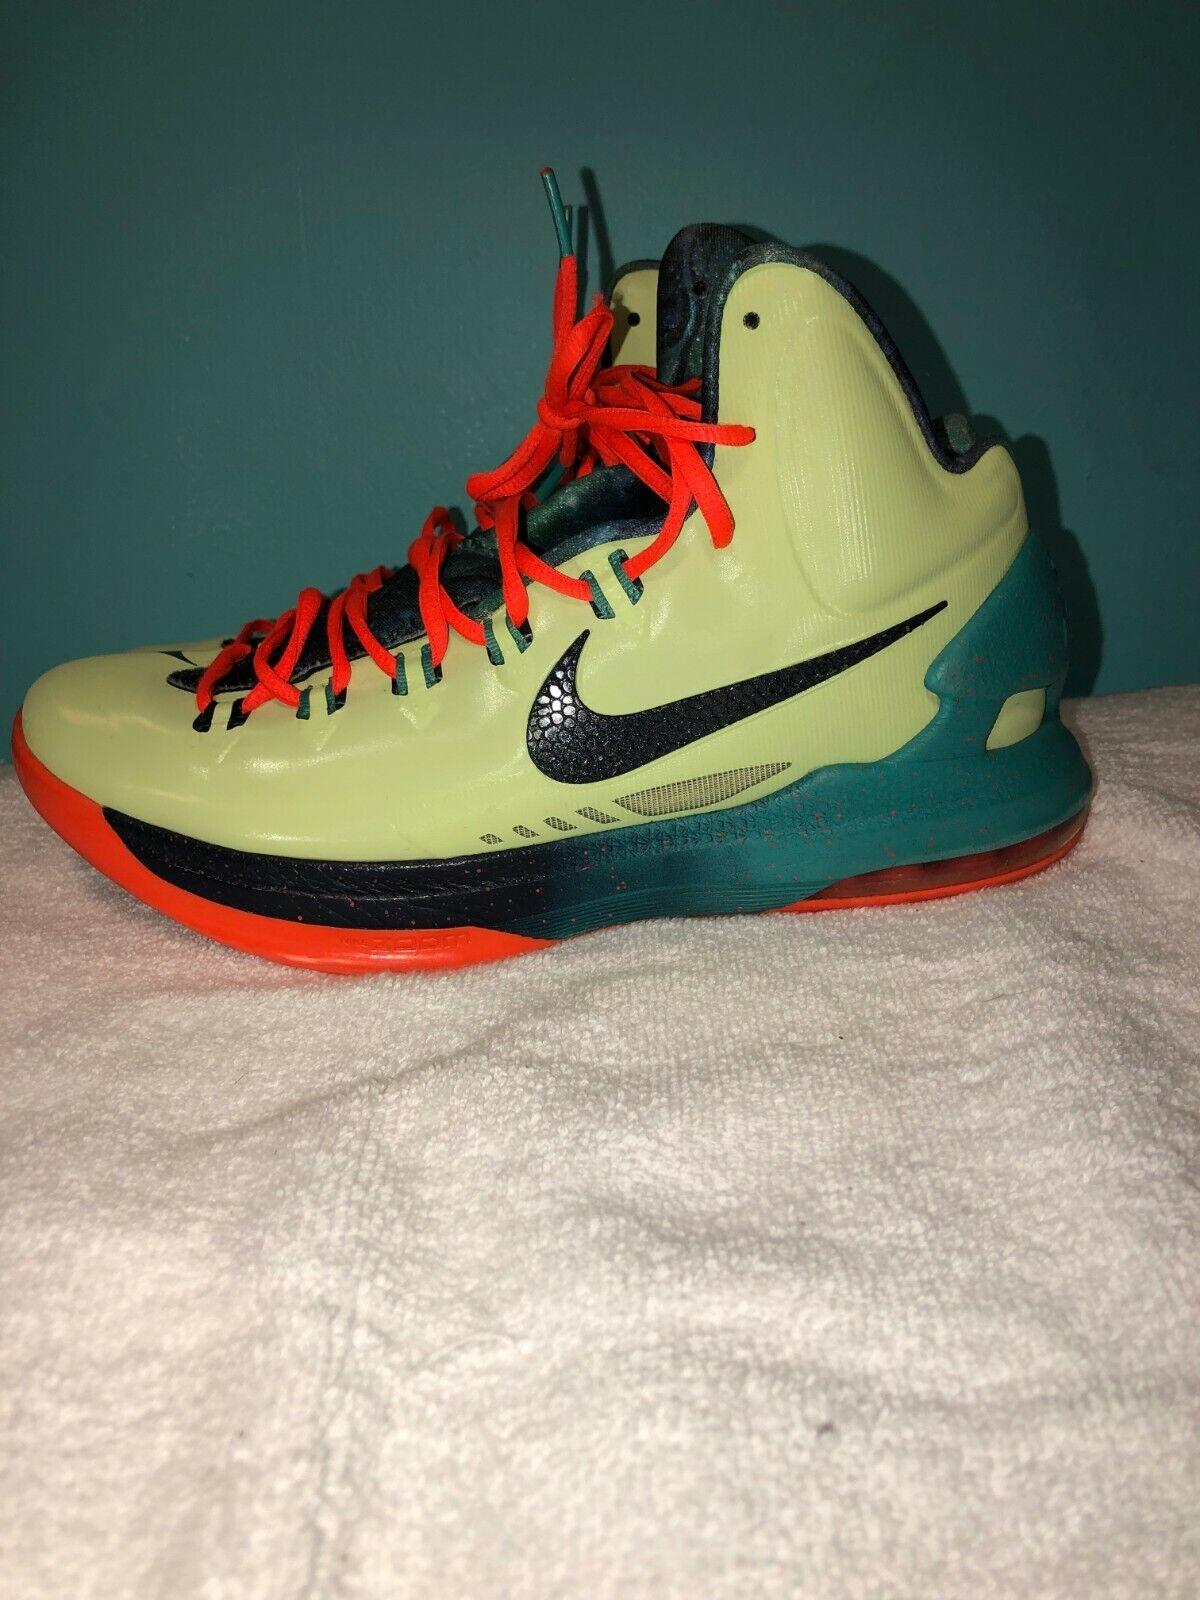 premium selection 2e312 e79a7 Nike Nike Nike KD 5 V All Star Area 72 Size 10 4e3ea5 ...